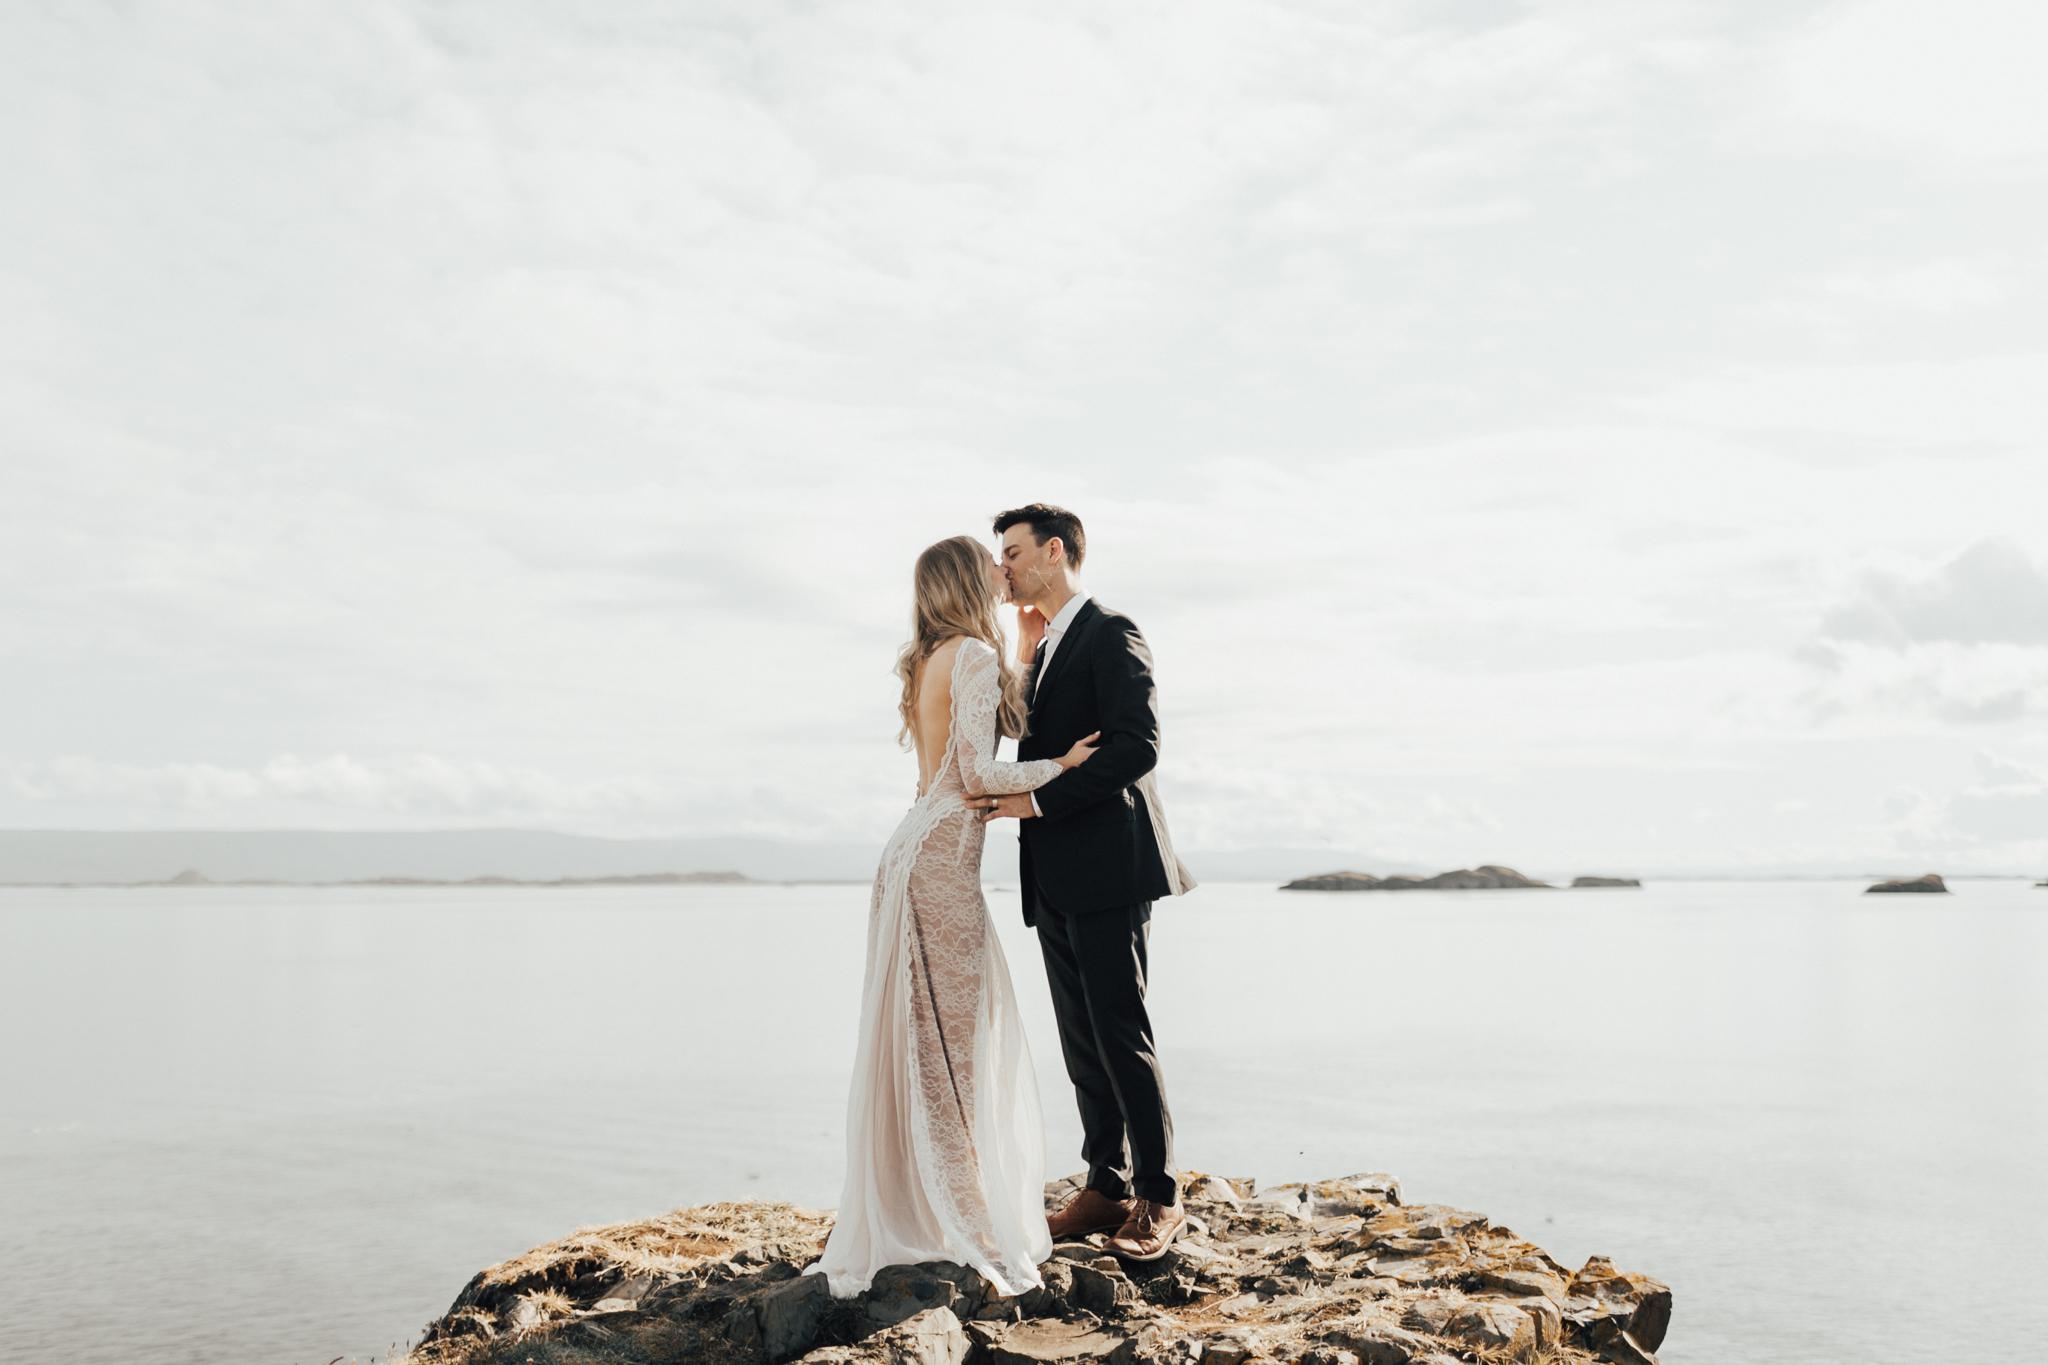 Melissa_Marshall_Iceland_Elopement_27.jpg